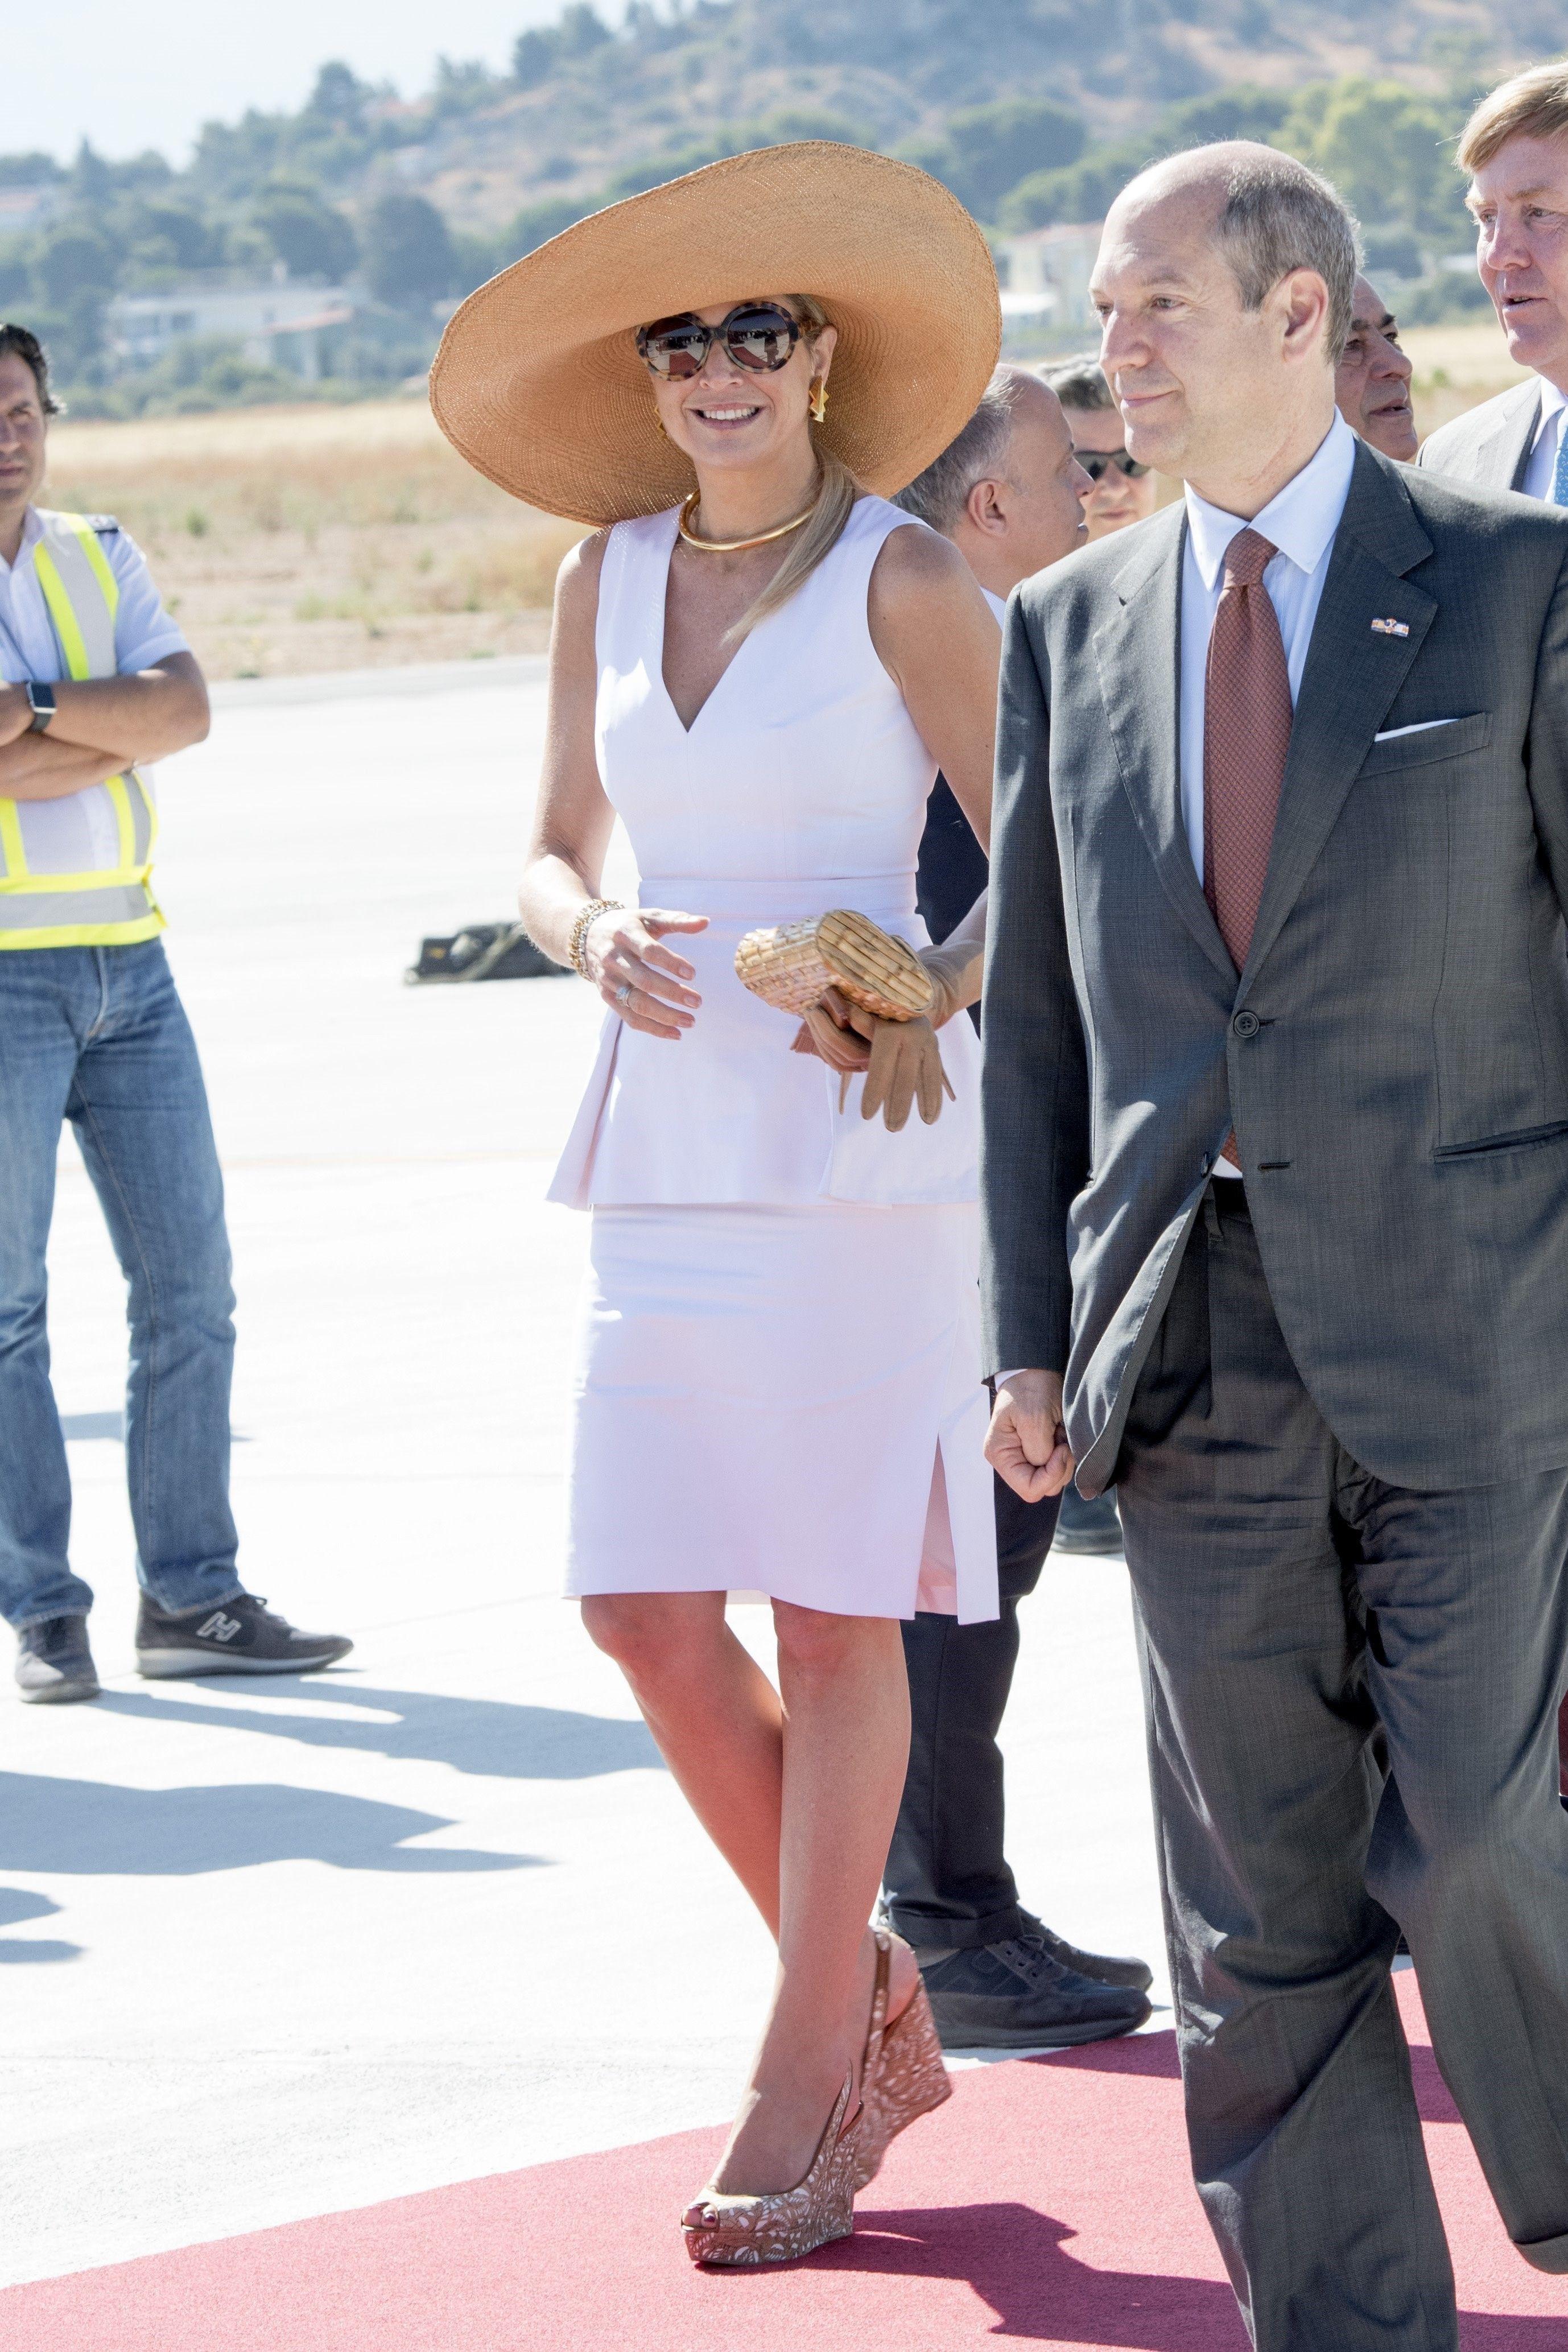 Max and Willem Alexander Visit Italy 23 Jun 2017